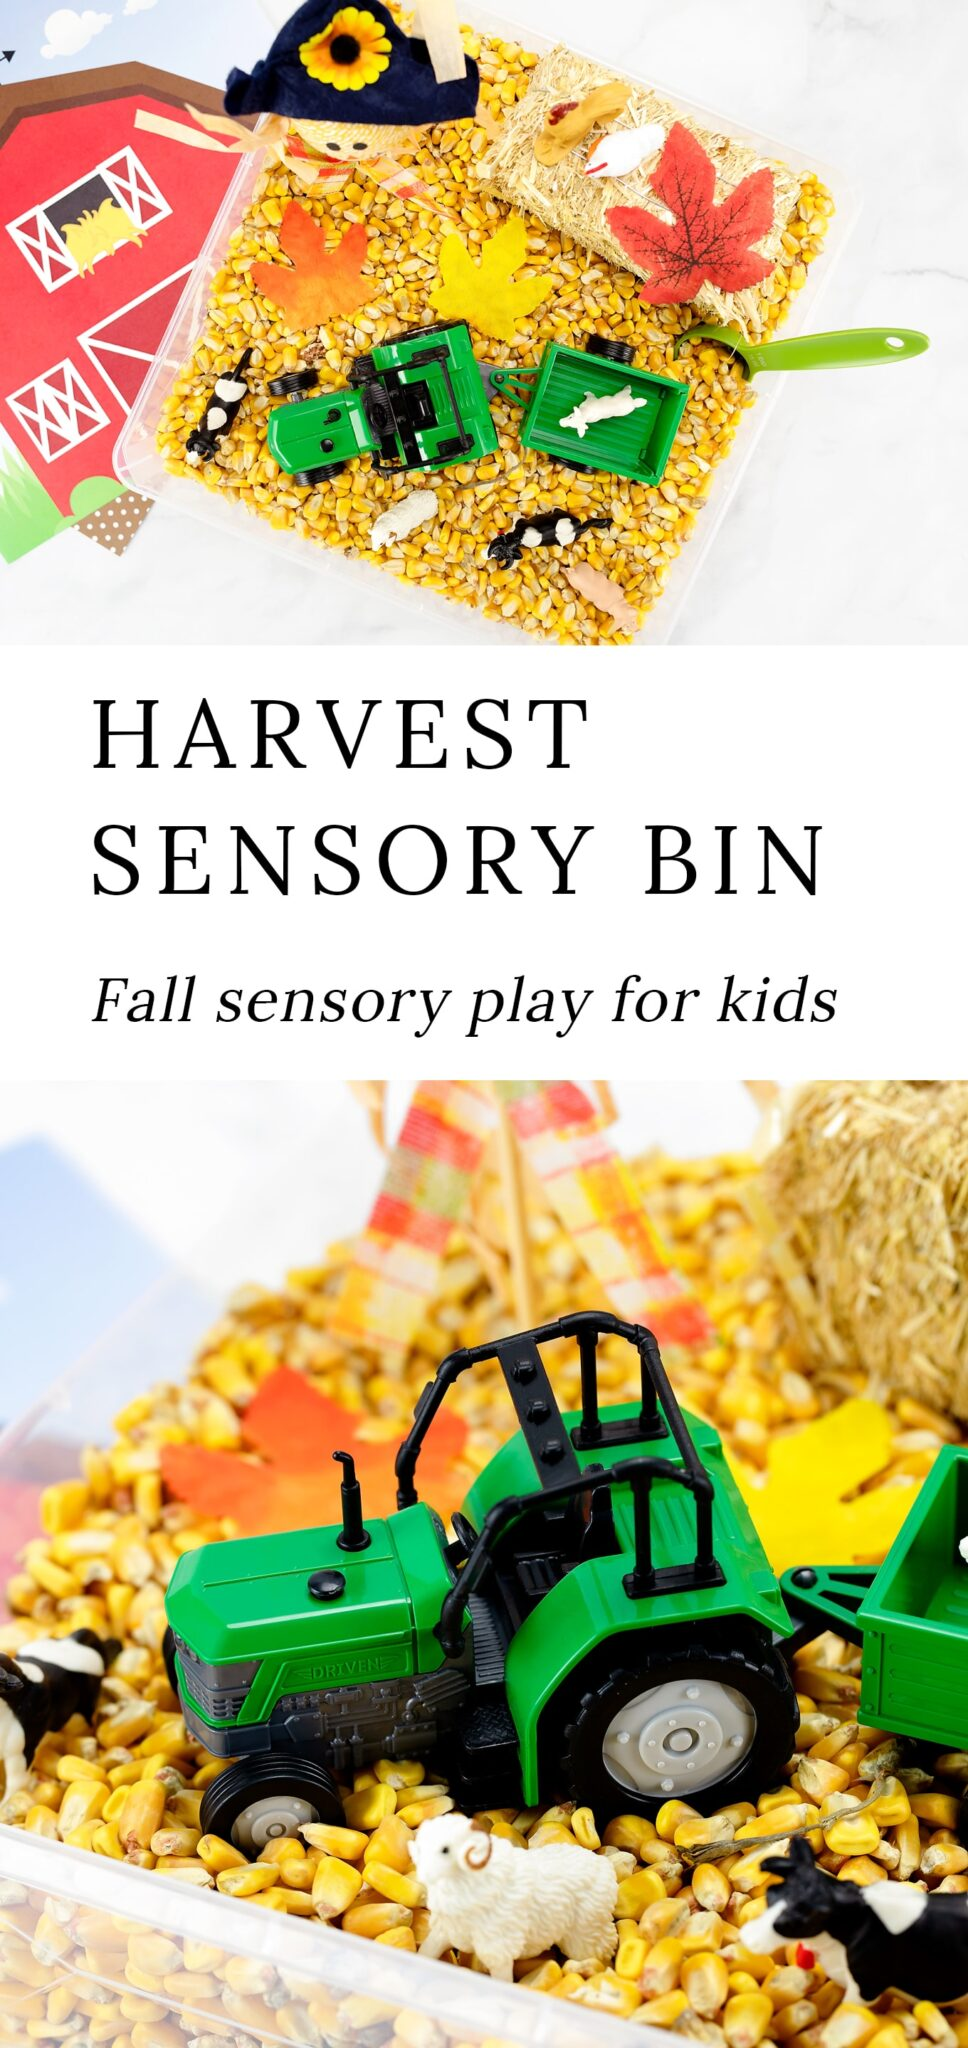 This Harvest Sensory Bin is a fun way for toddlers, preschoolers, kindergartners, and older kids to explore textures and practice fine-motor skills! #harvest #sensorybin #fall #toddlers #kids #preschool via @firefliesandmudpies